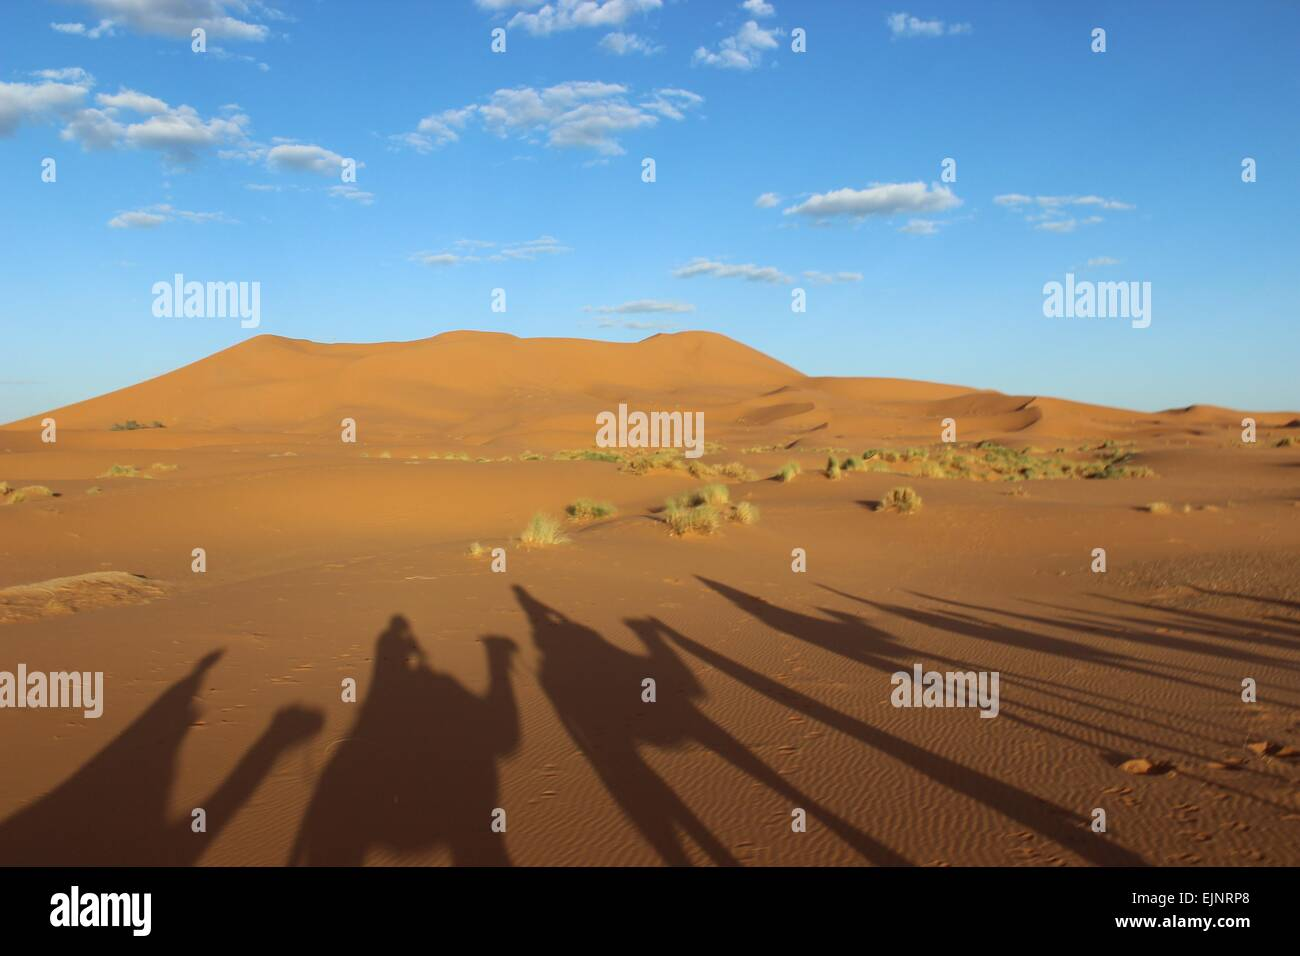 Camels shadows on the sahara desert - Stock Image